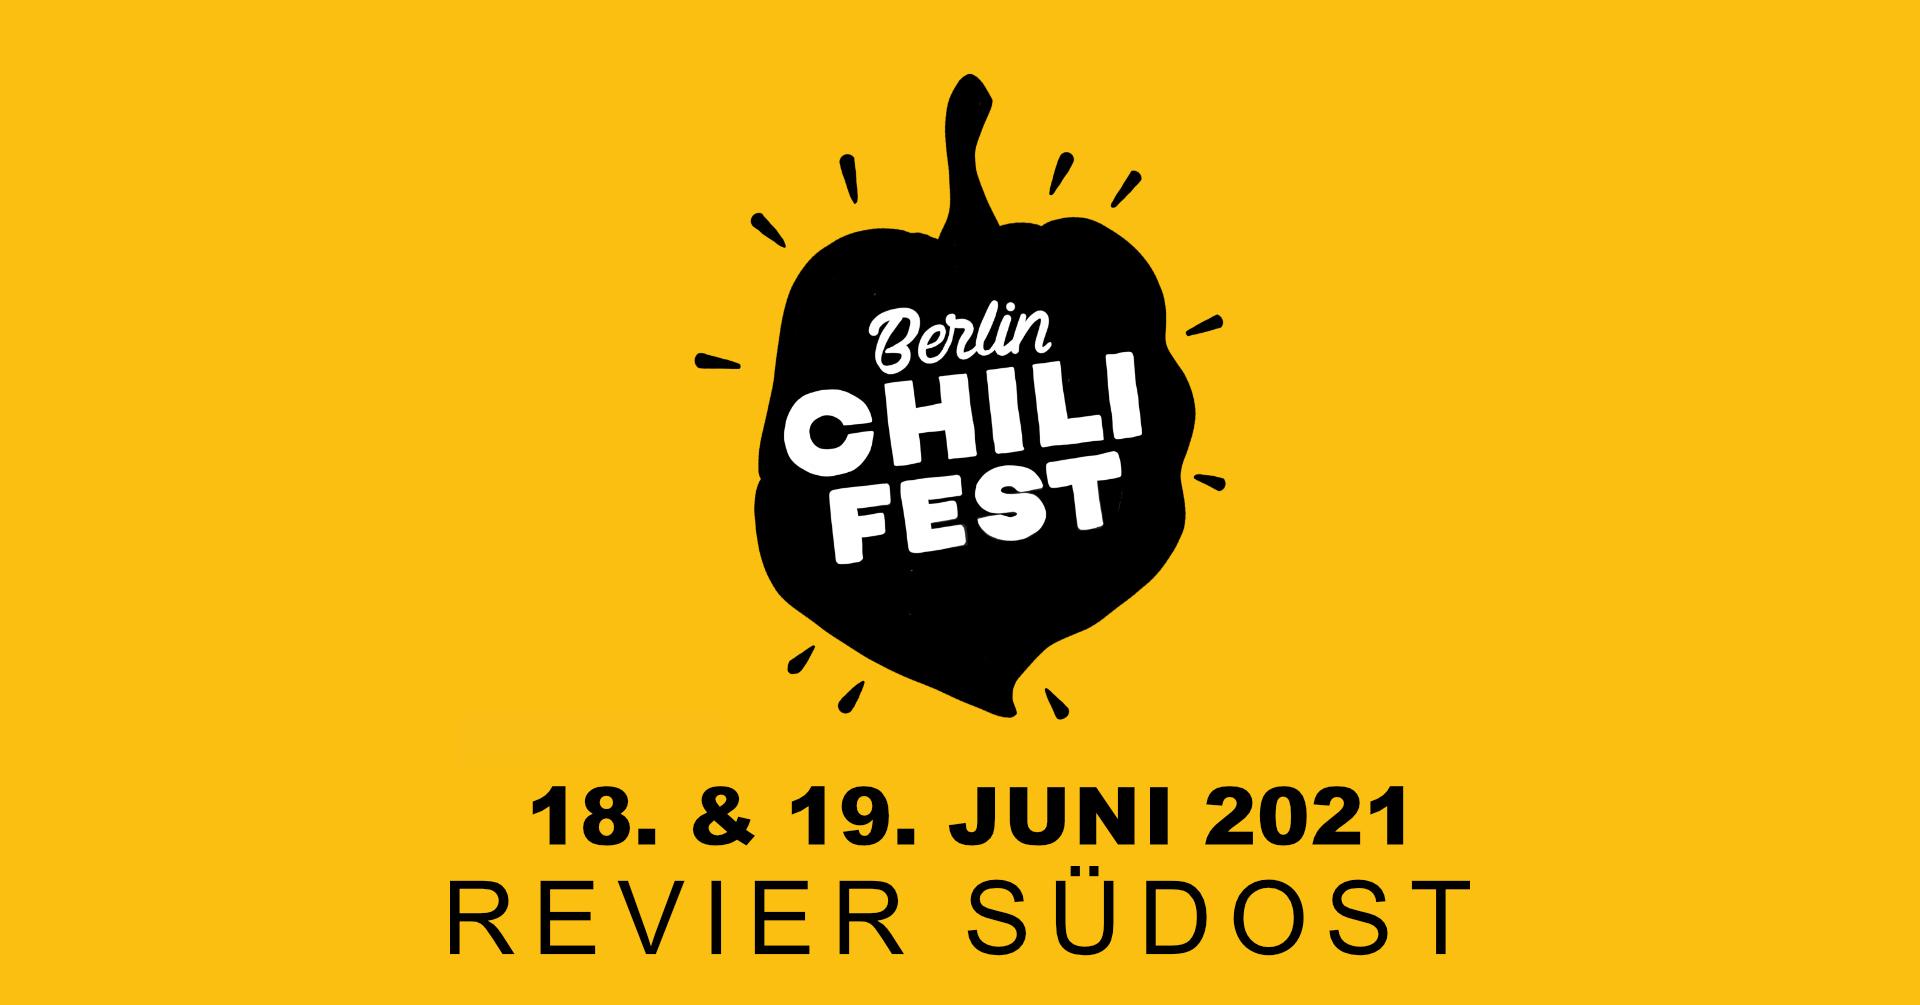 Berlin Chili Fest : Summer 2021